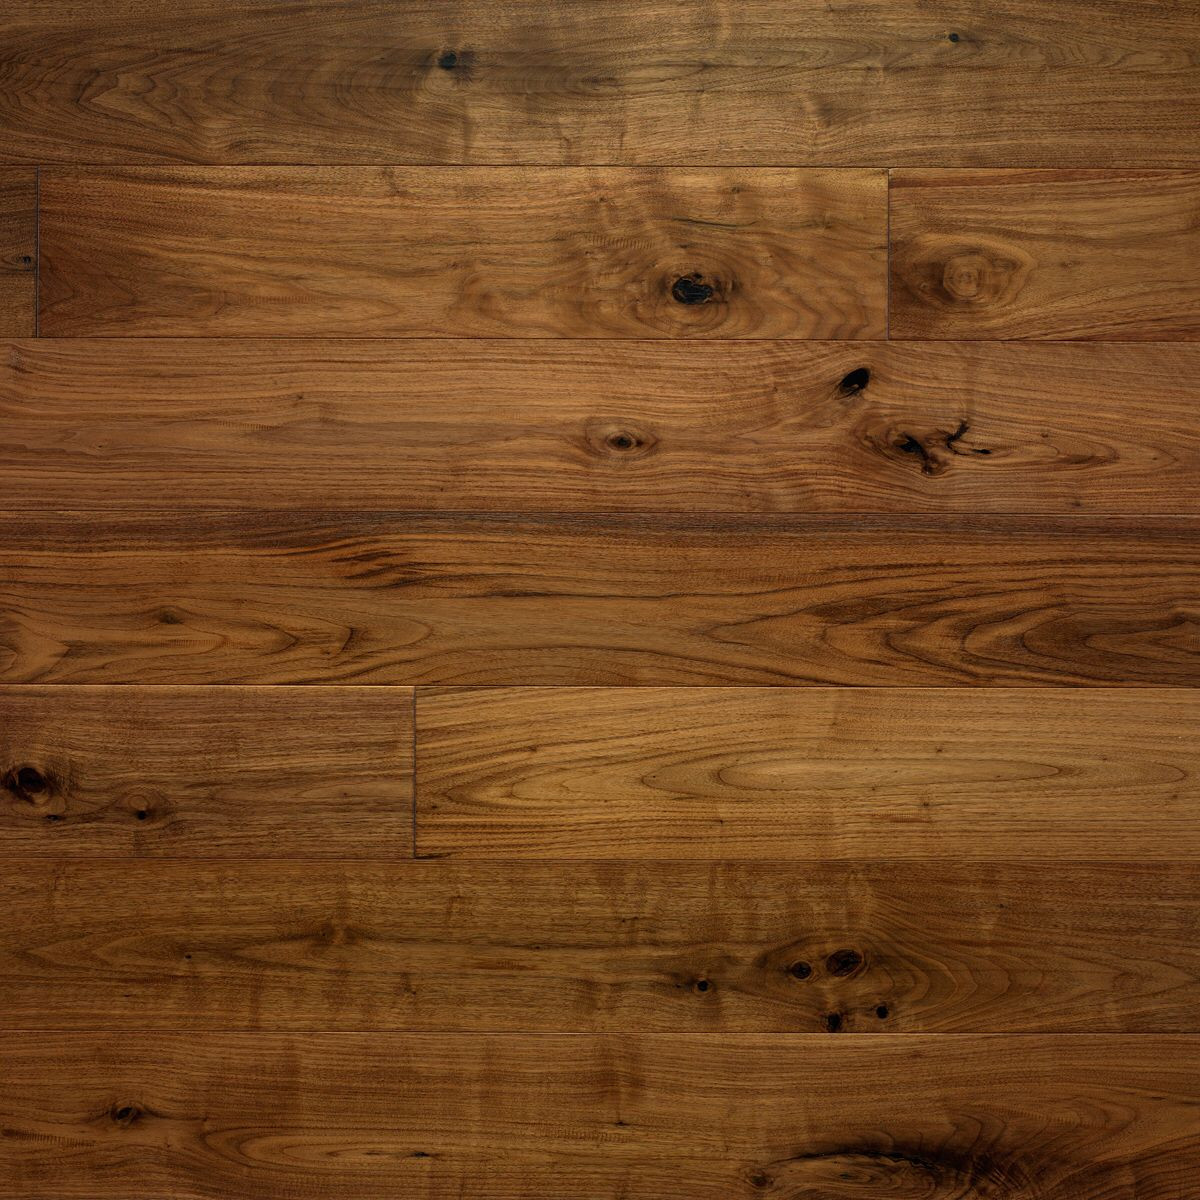 cost to install floating engineered hardwood floor of kentwood originals sculpted walnut wide plank engineered hardwood with kentwood originals sculpted walnut wide plank engineered hardwood